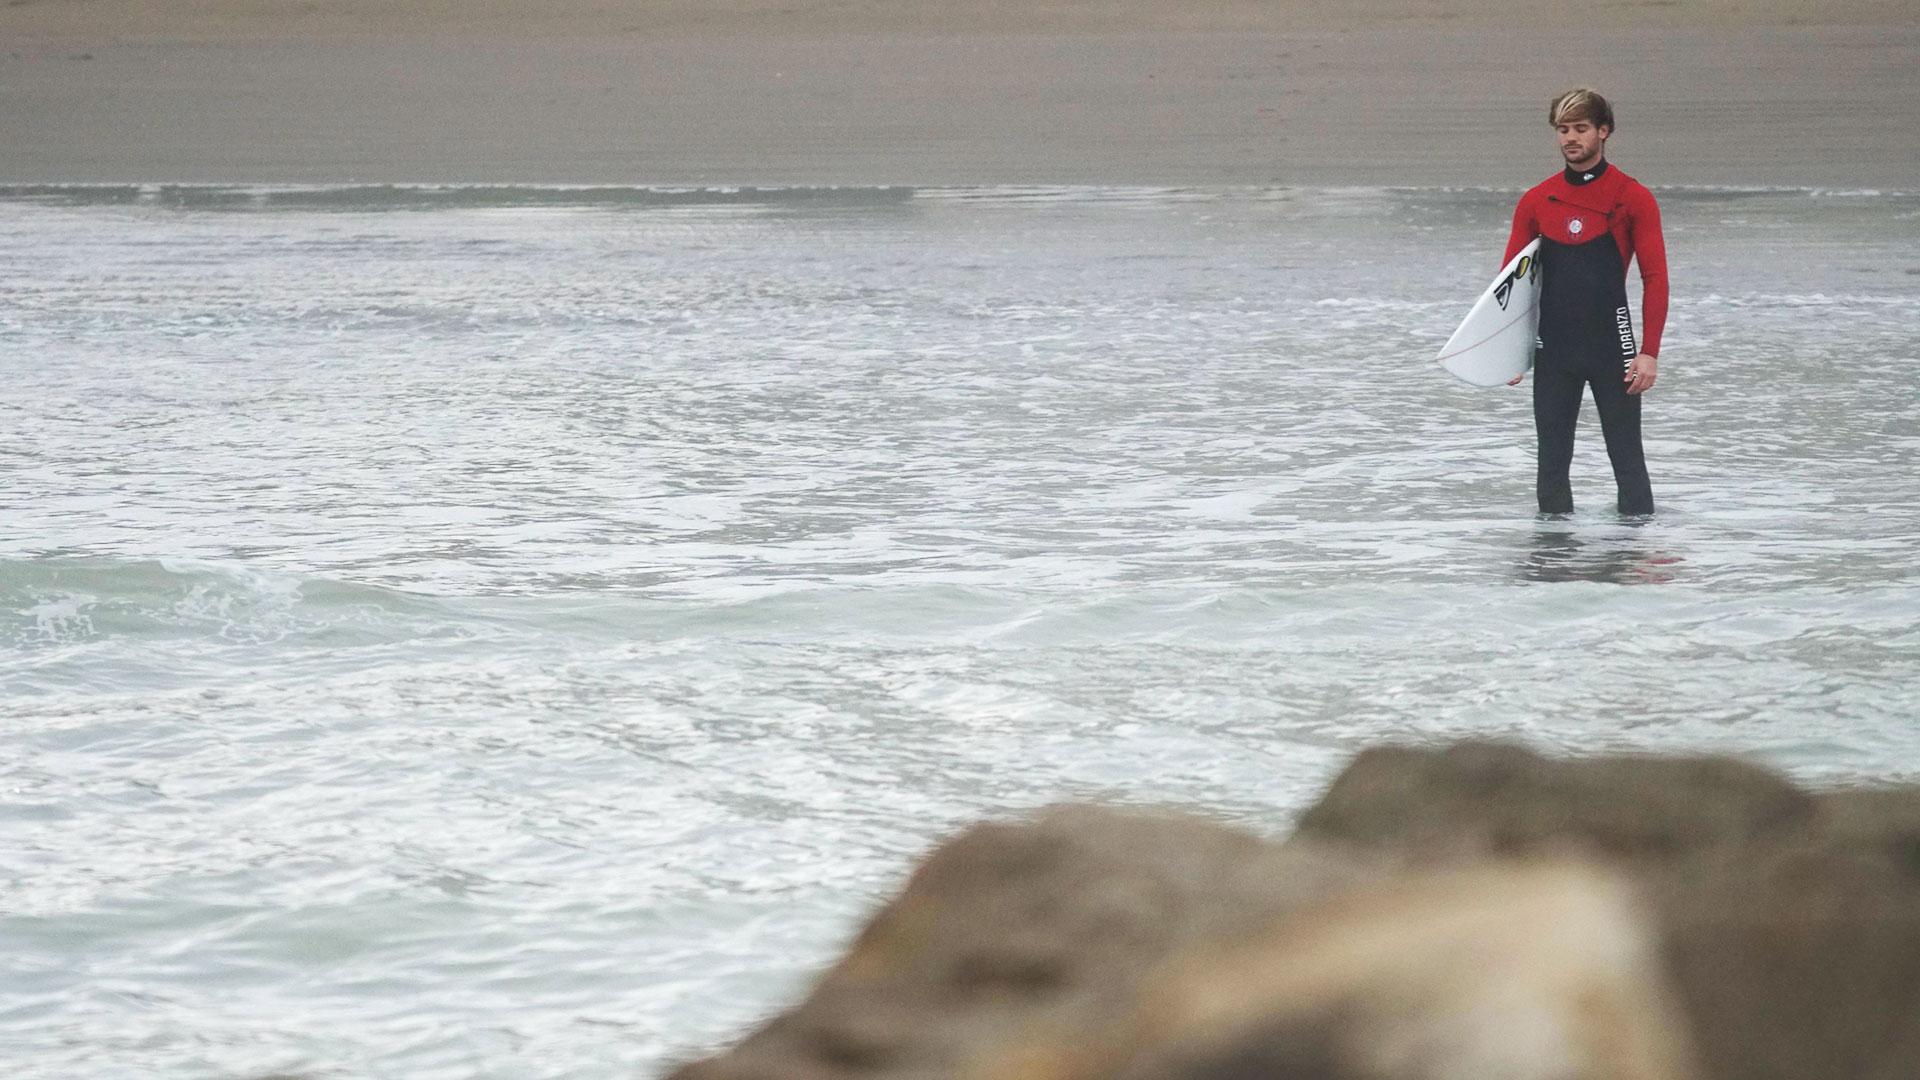 Circuito Mundial De Surf : San lorenzo tendrá un representante en el circuito mundial de surf